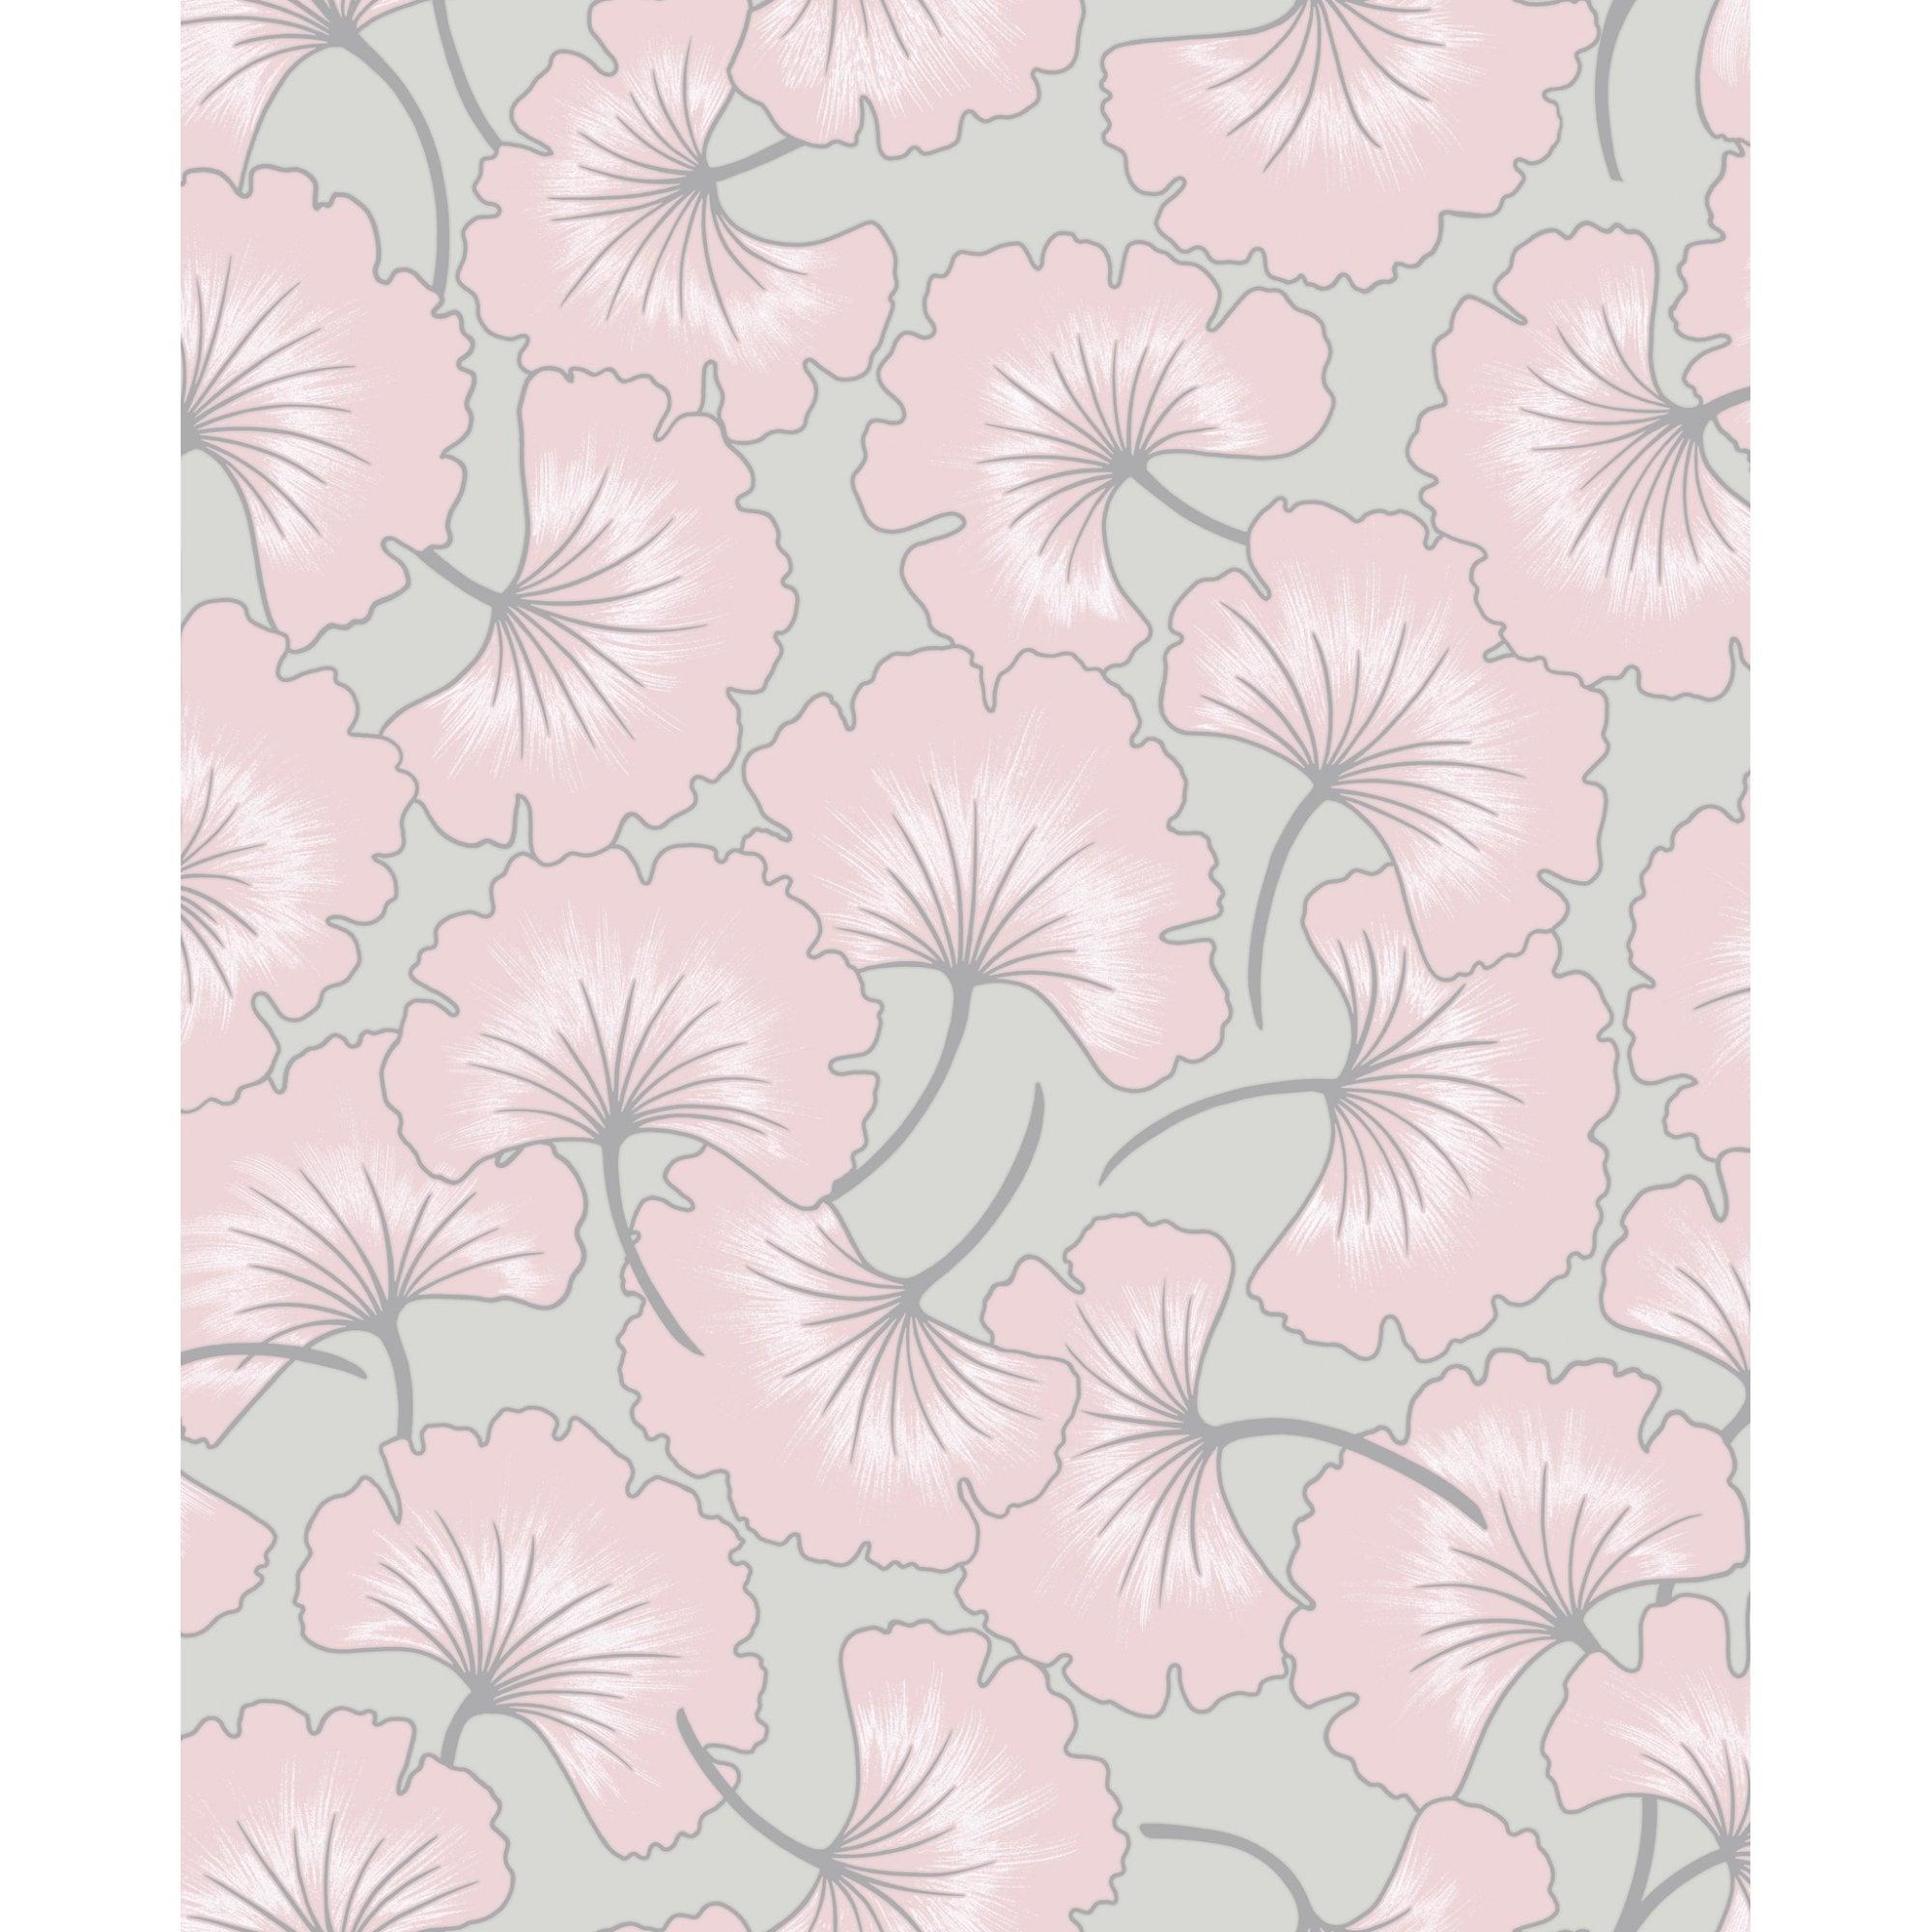 Graham Brown Ginko Grey Pink Floral Wallpaper 105983